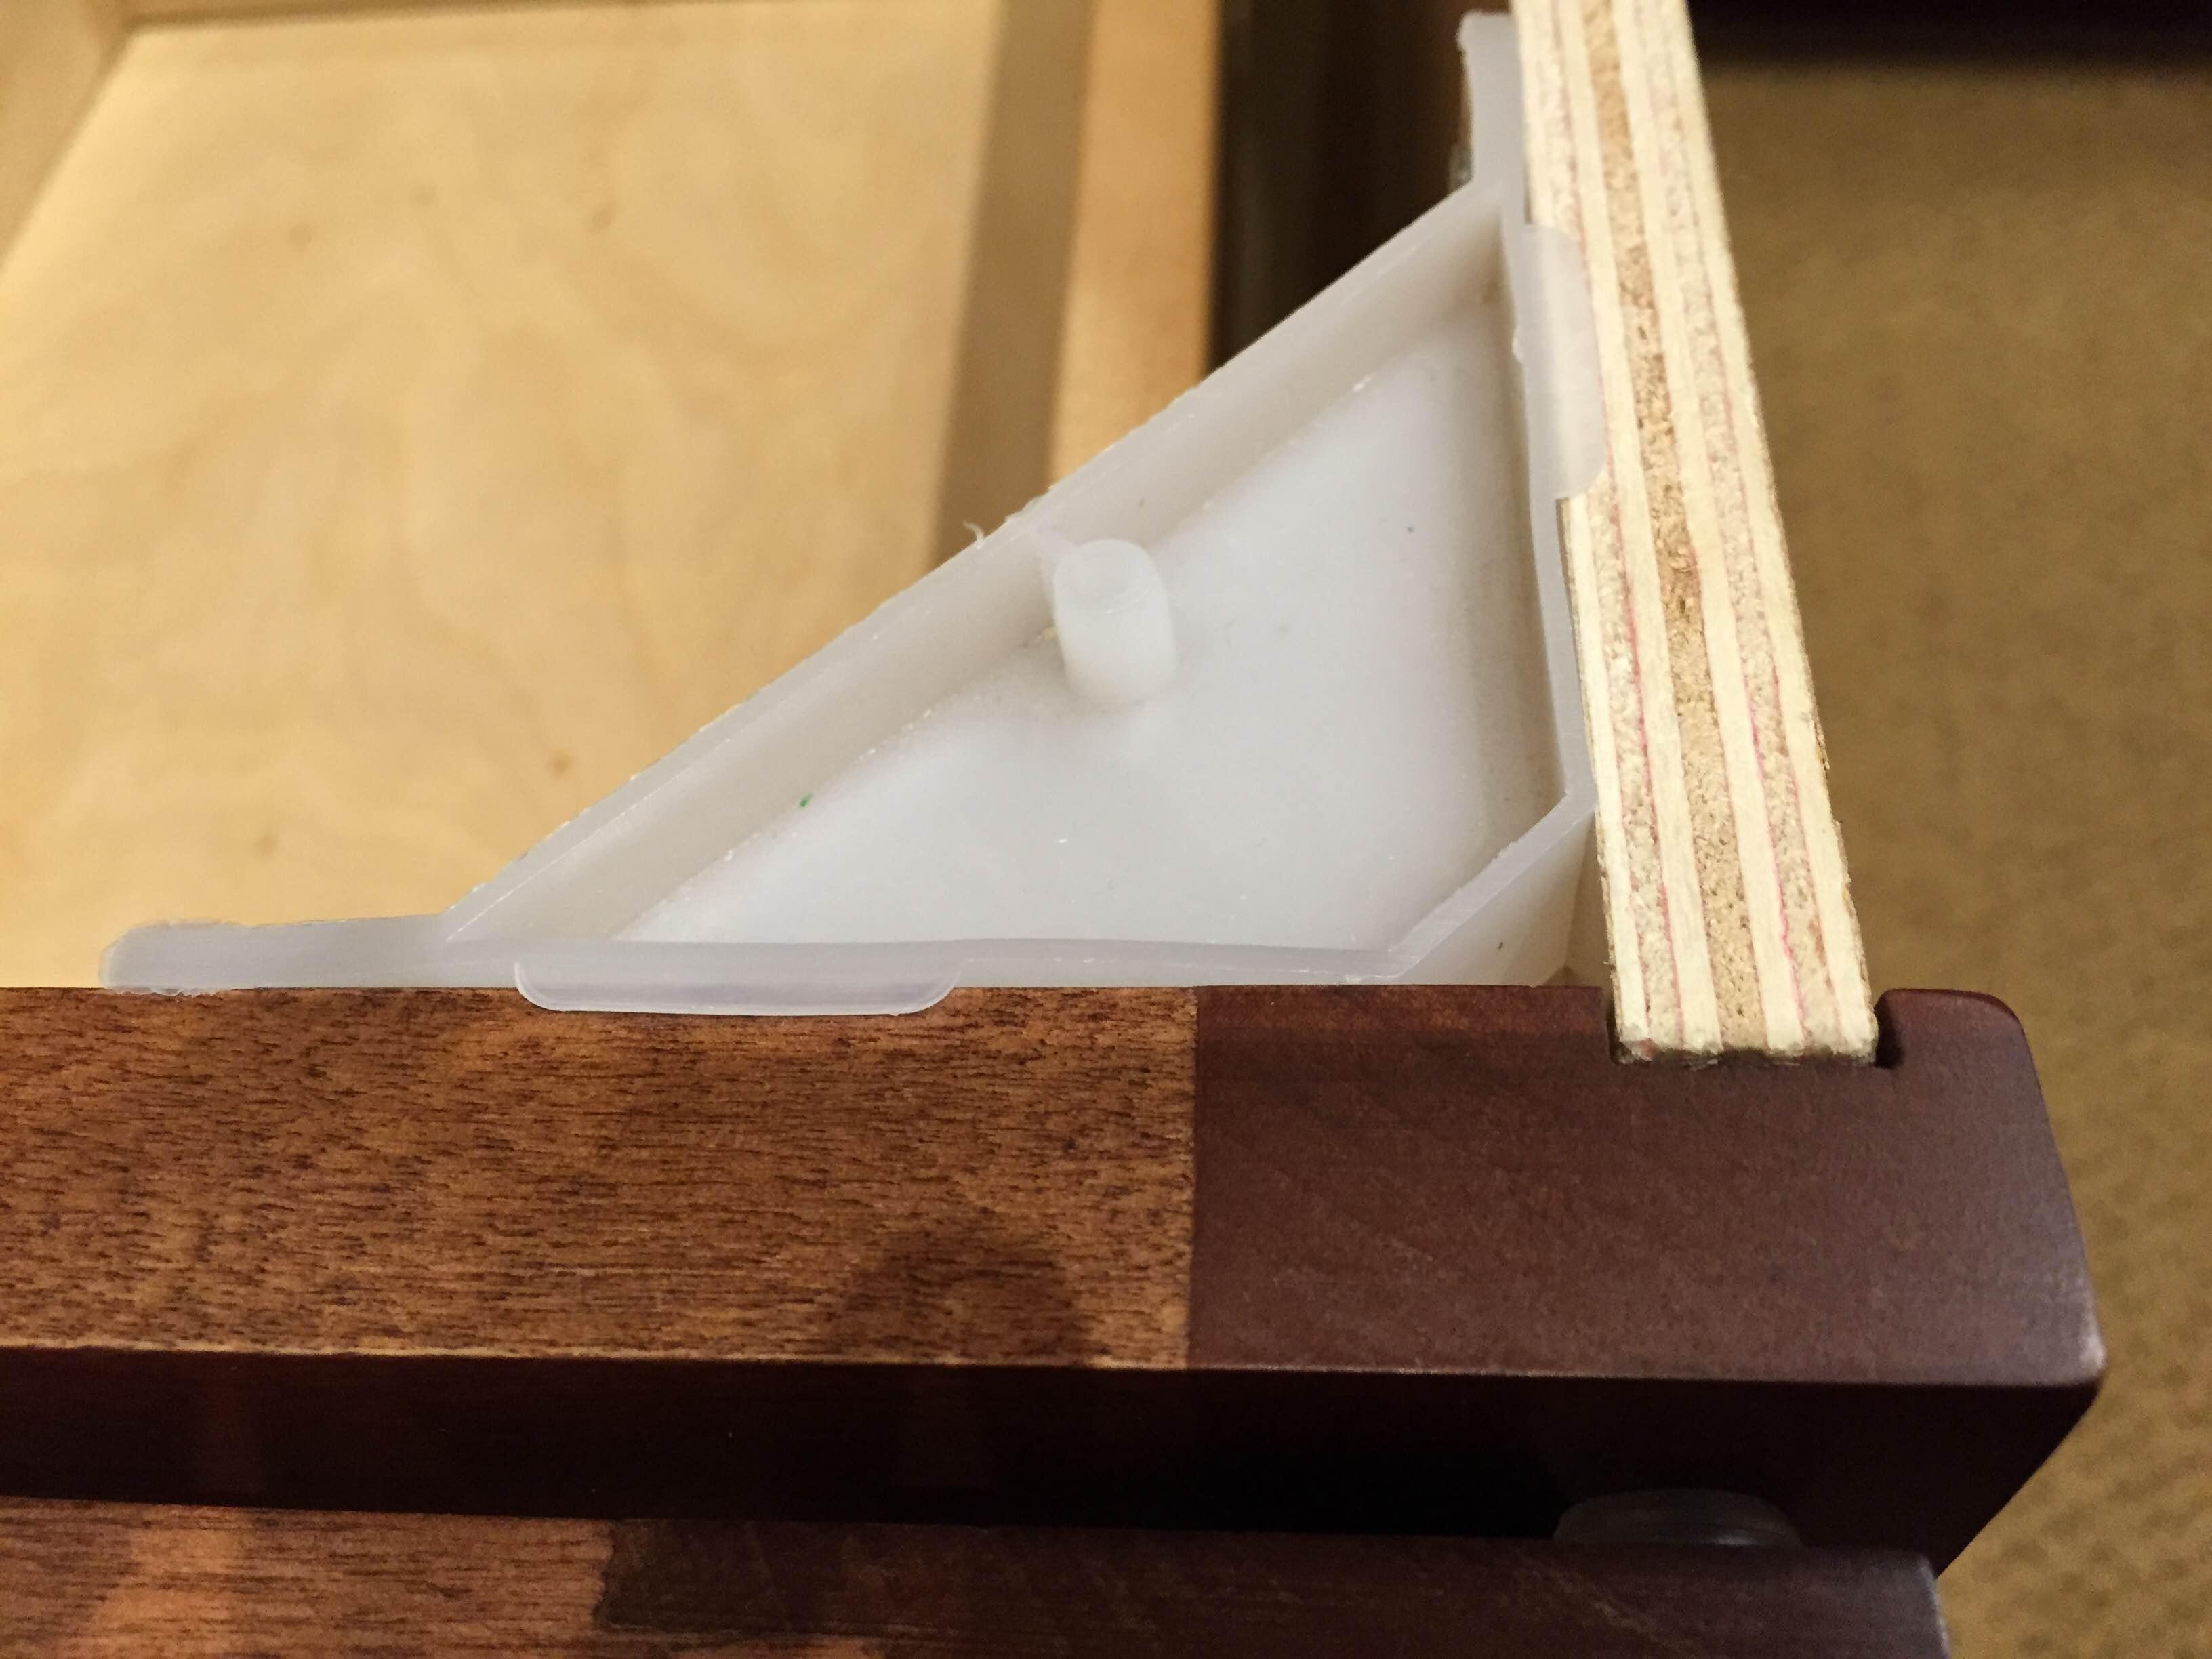 Plywood Siding Lowes Plywood Siding Lowe 39 s t1